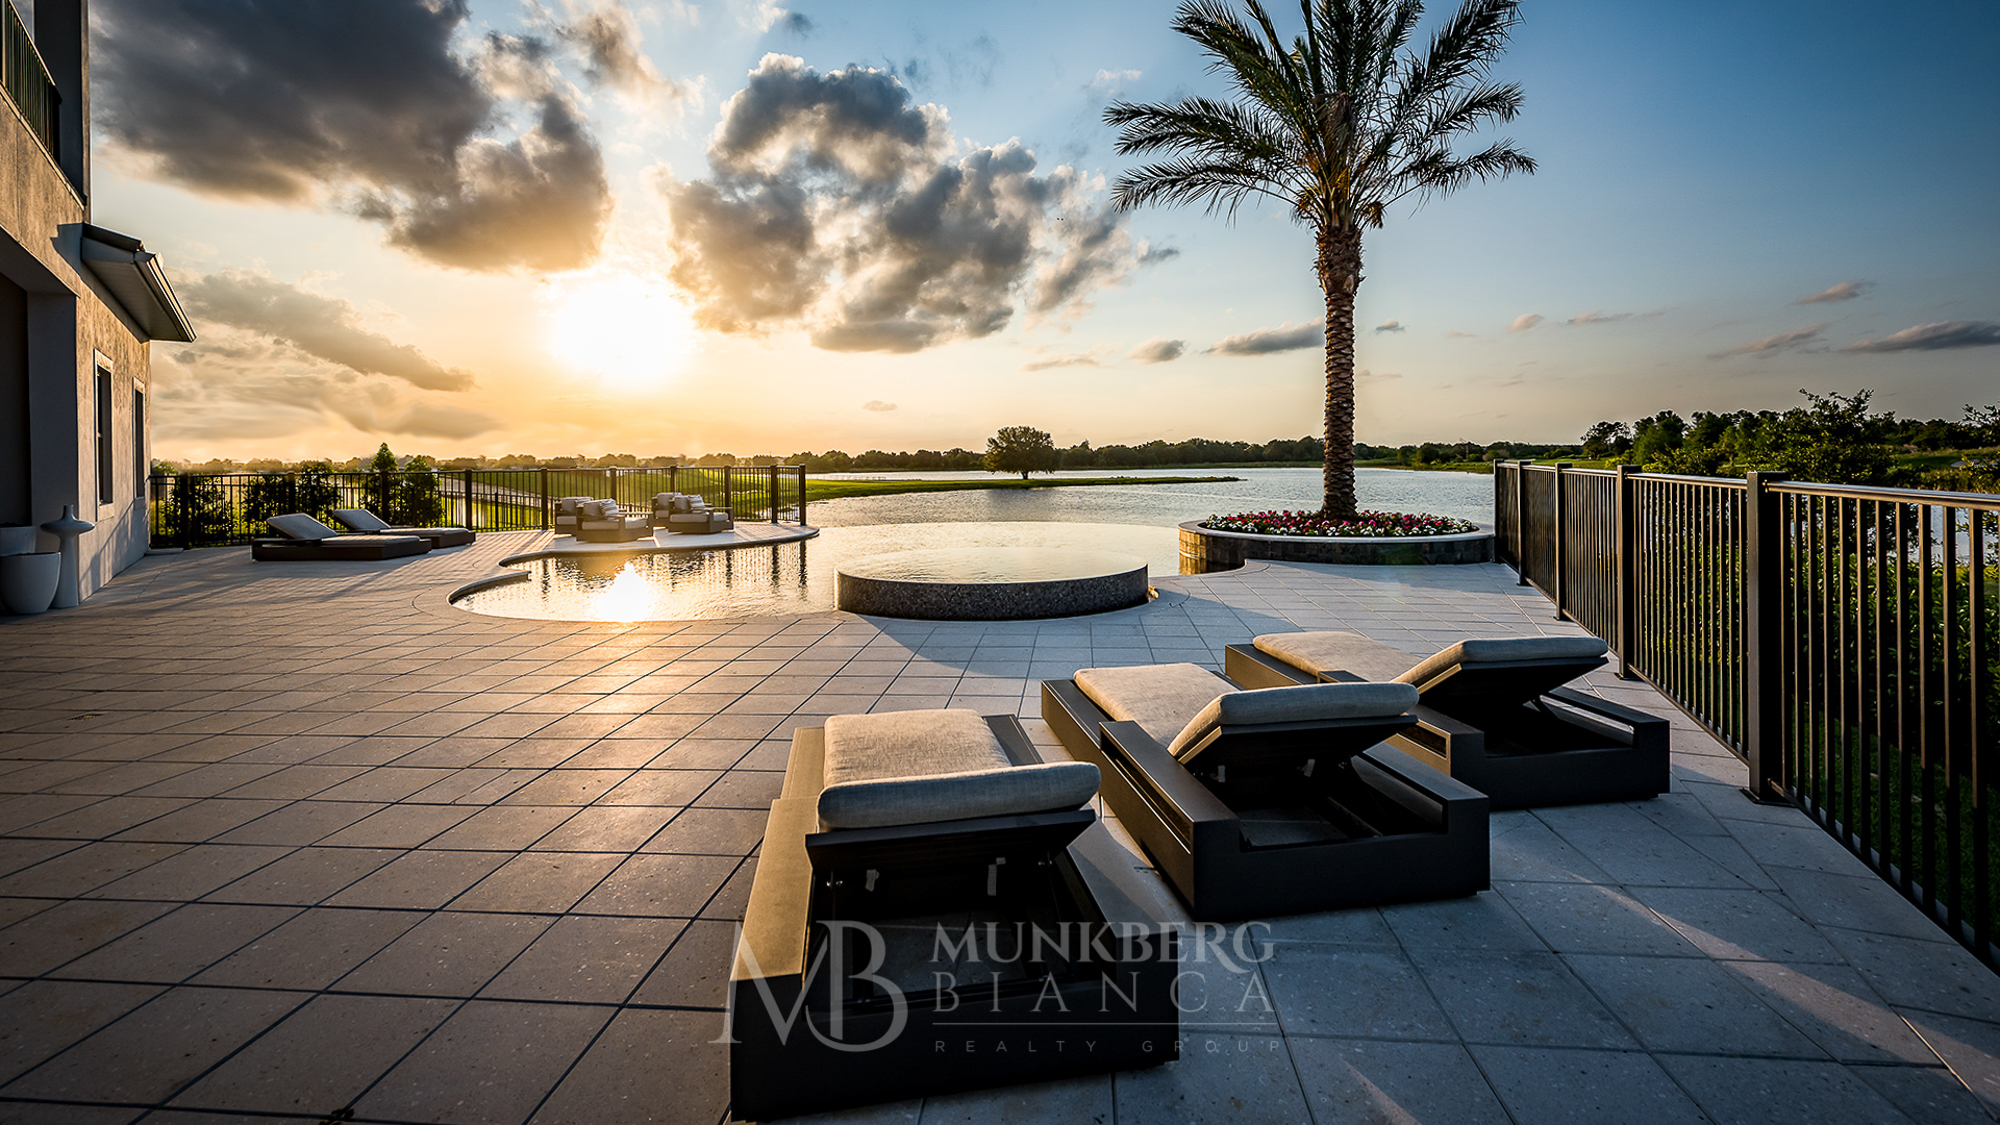 Real Estate Marketing | Munkberg Bianca Realty Group